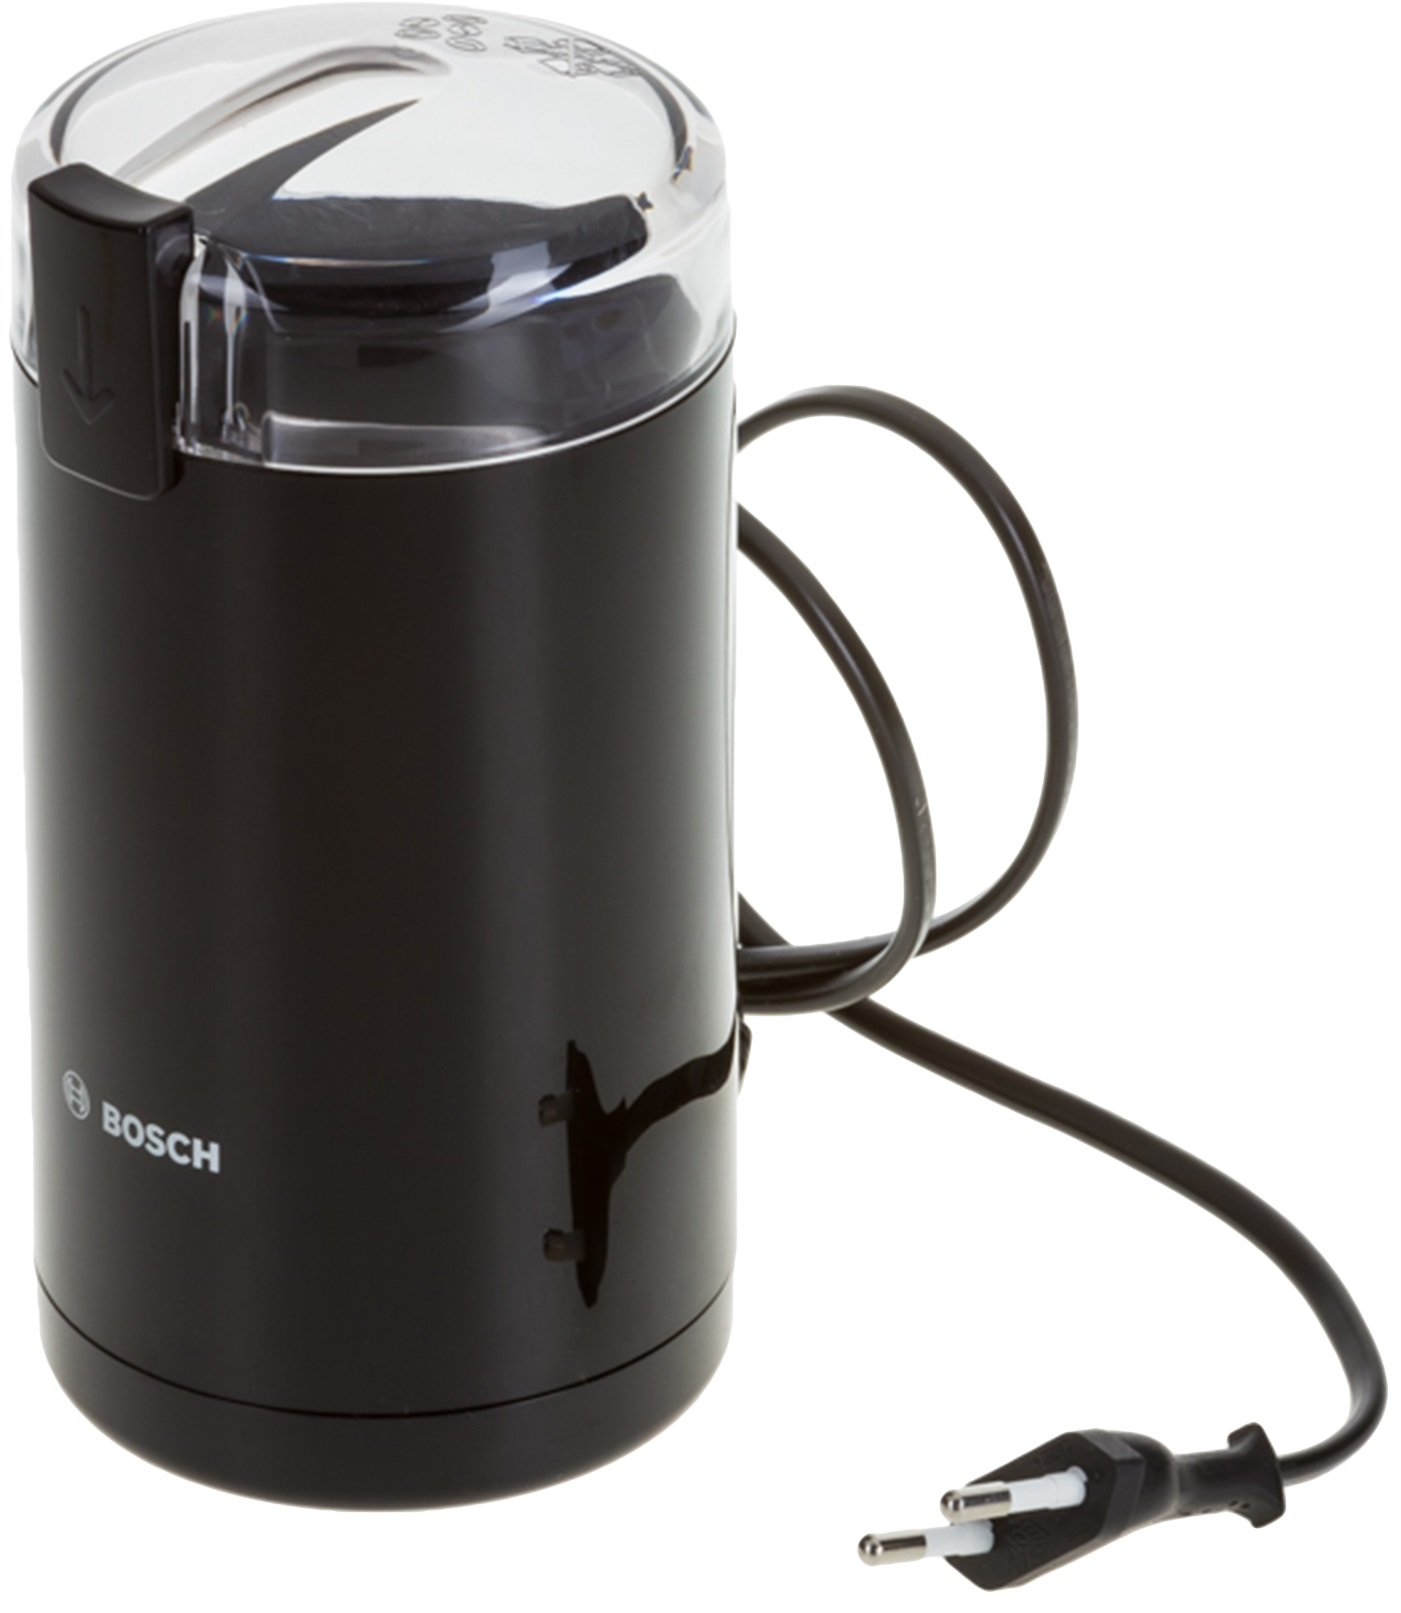 Bosch MKM 6003 - кофемолка (Black)